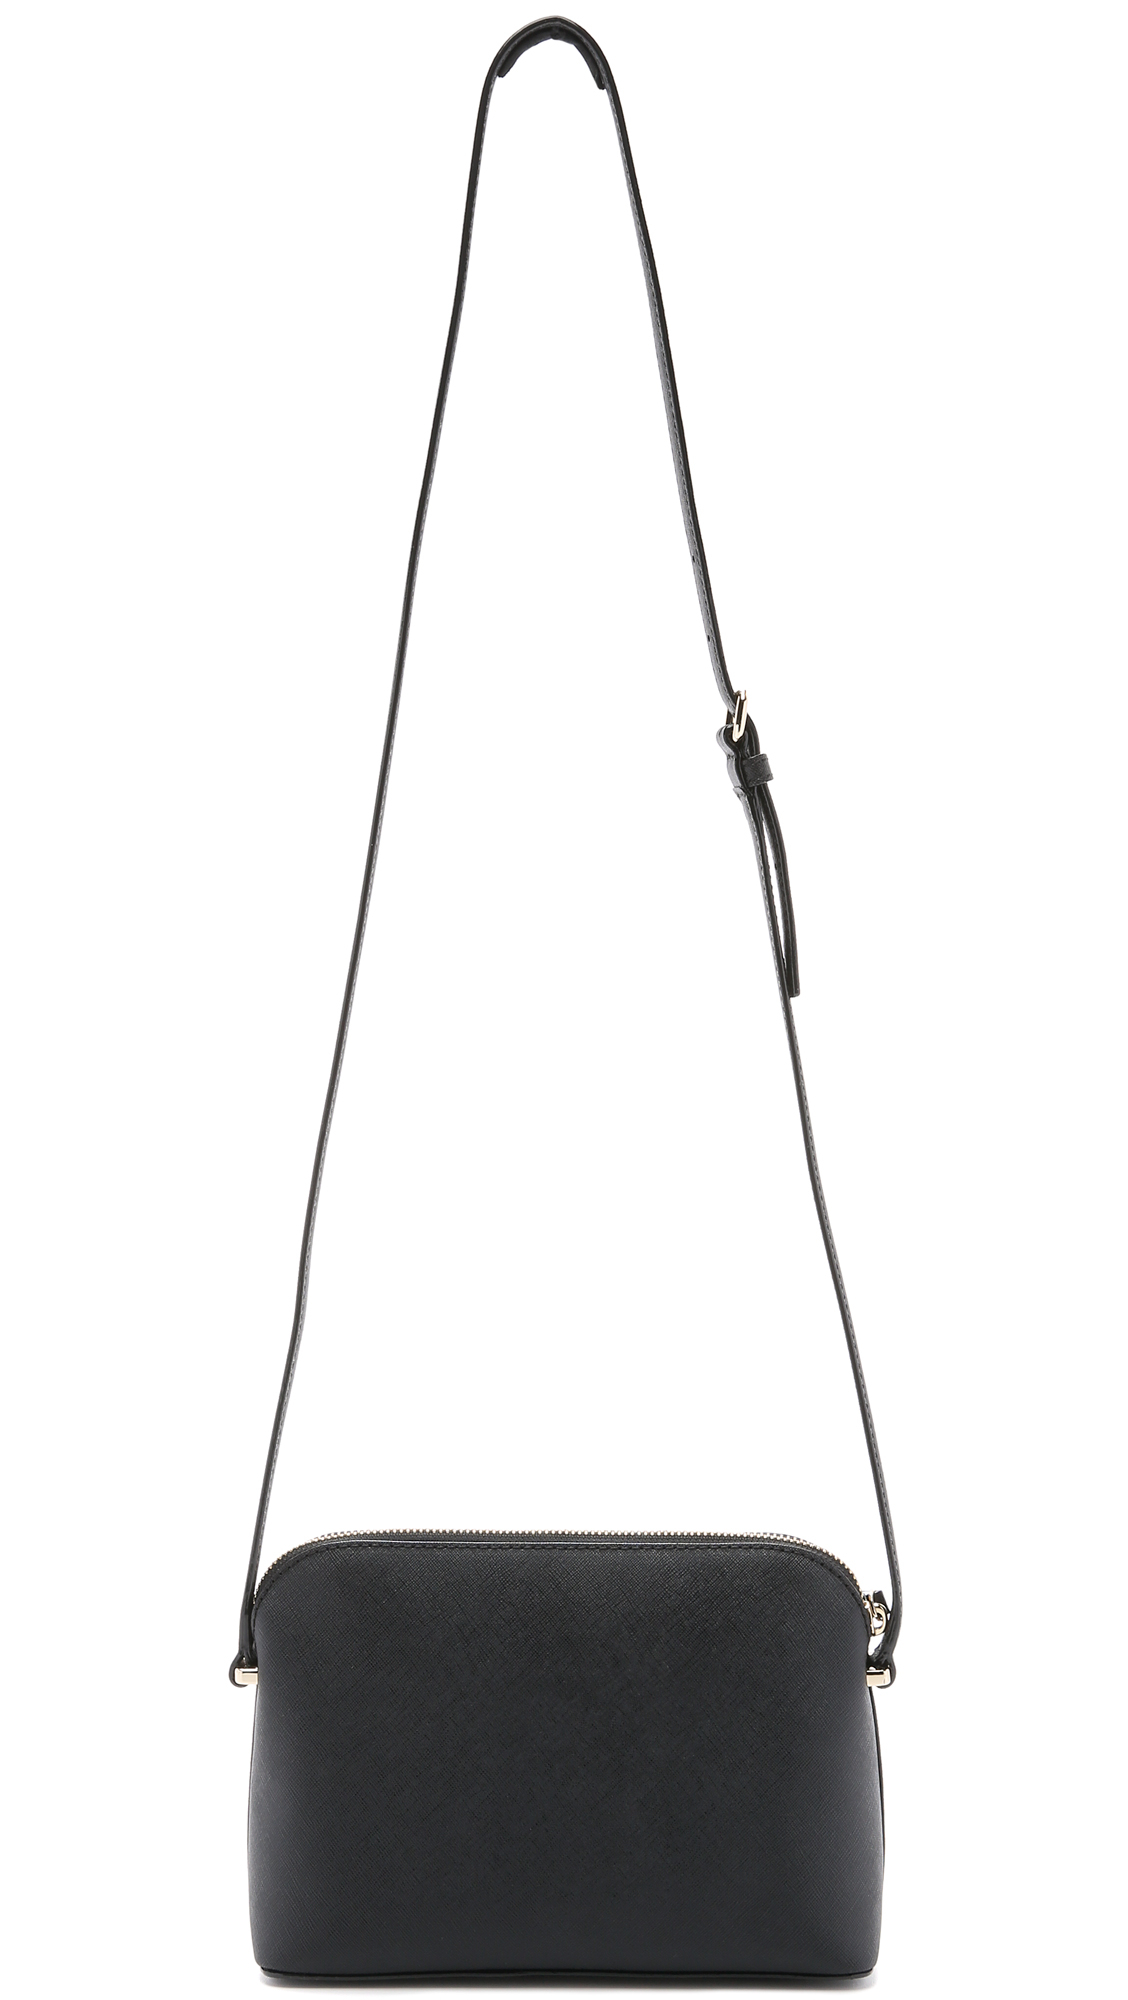 aef0ed874bc1 Lyst - Kate Spade Mandy Dome Cross Body Bag - Black in Black